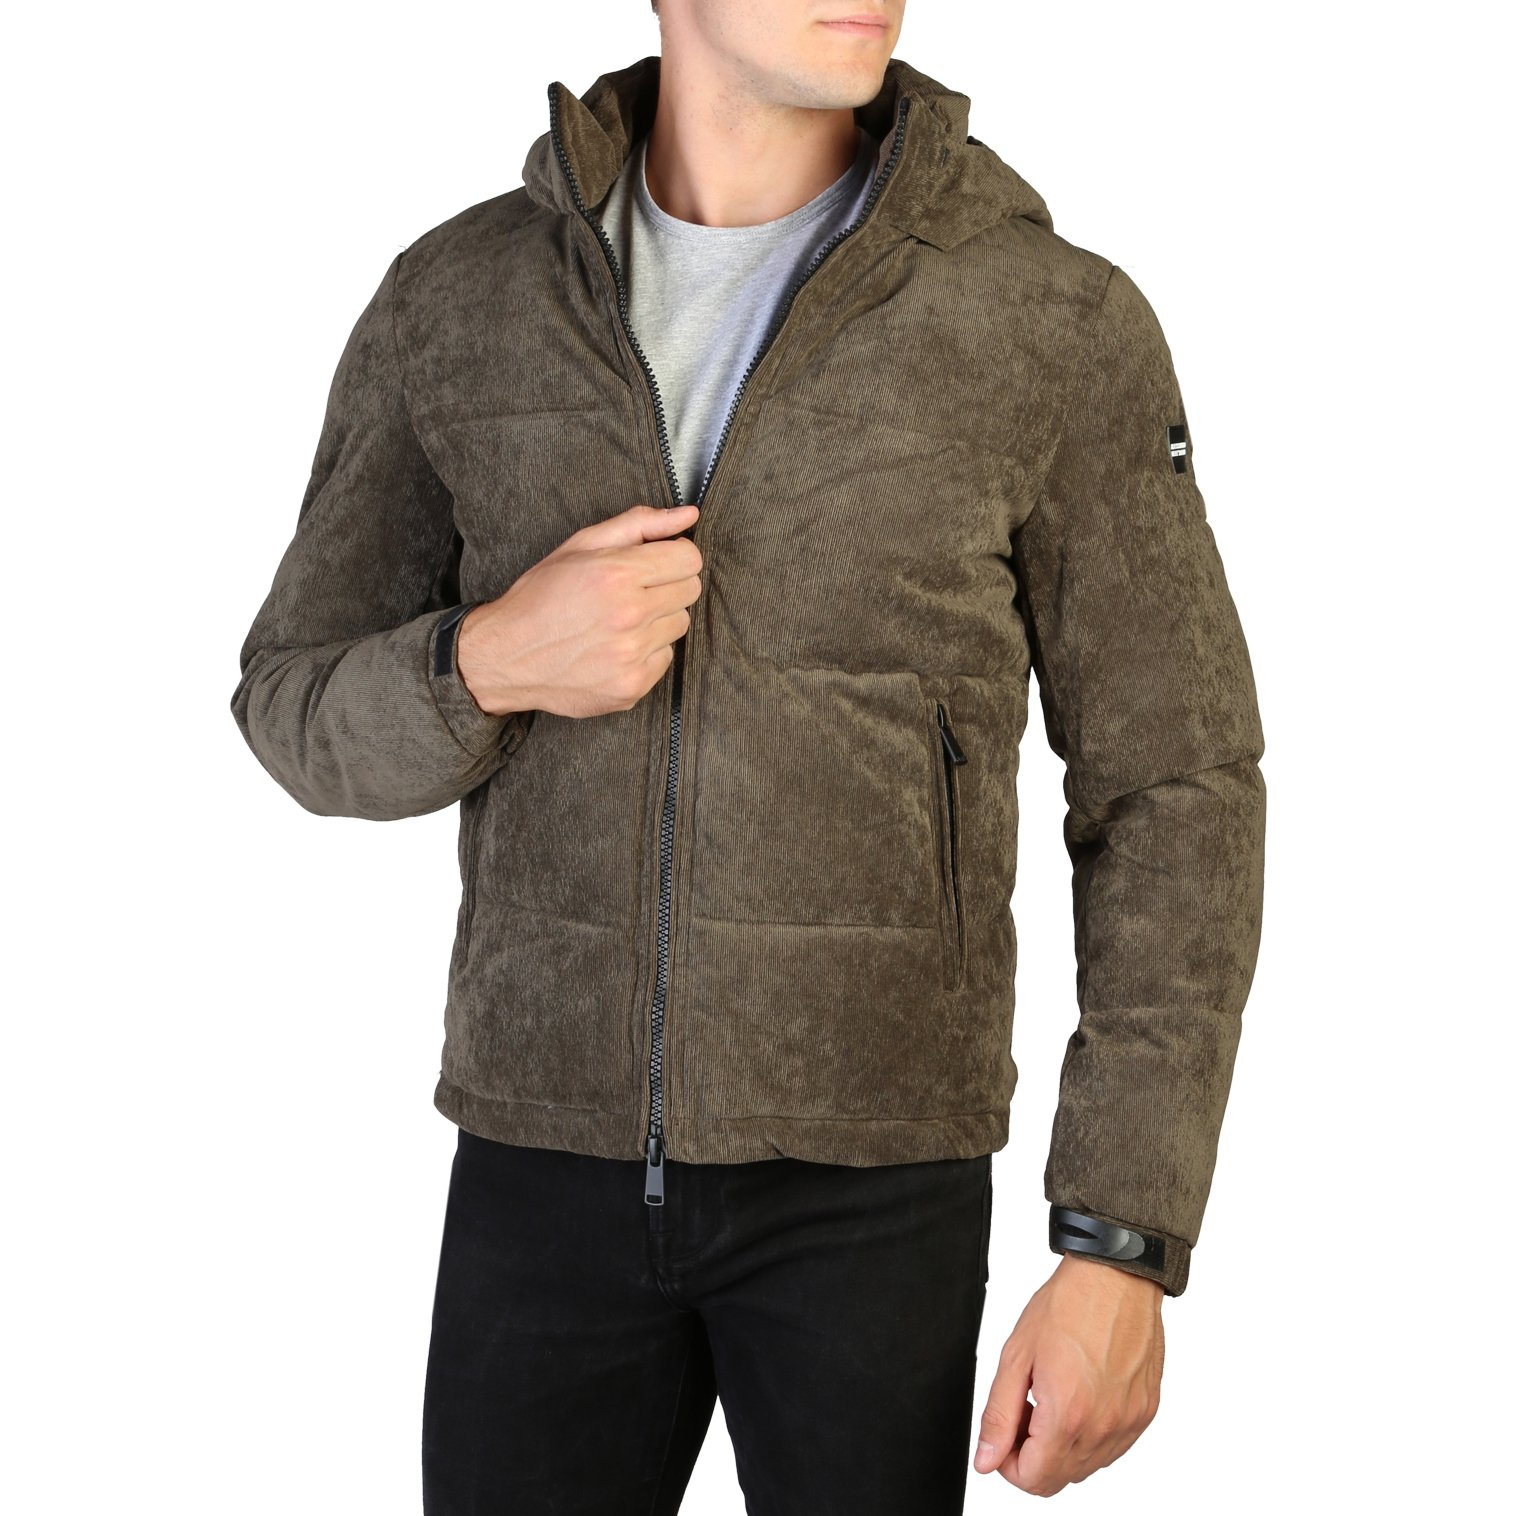 Alessandro Dell'Acqua Men's Jacket Various Colours 348318 - green XL